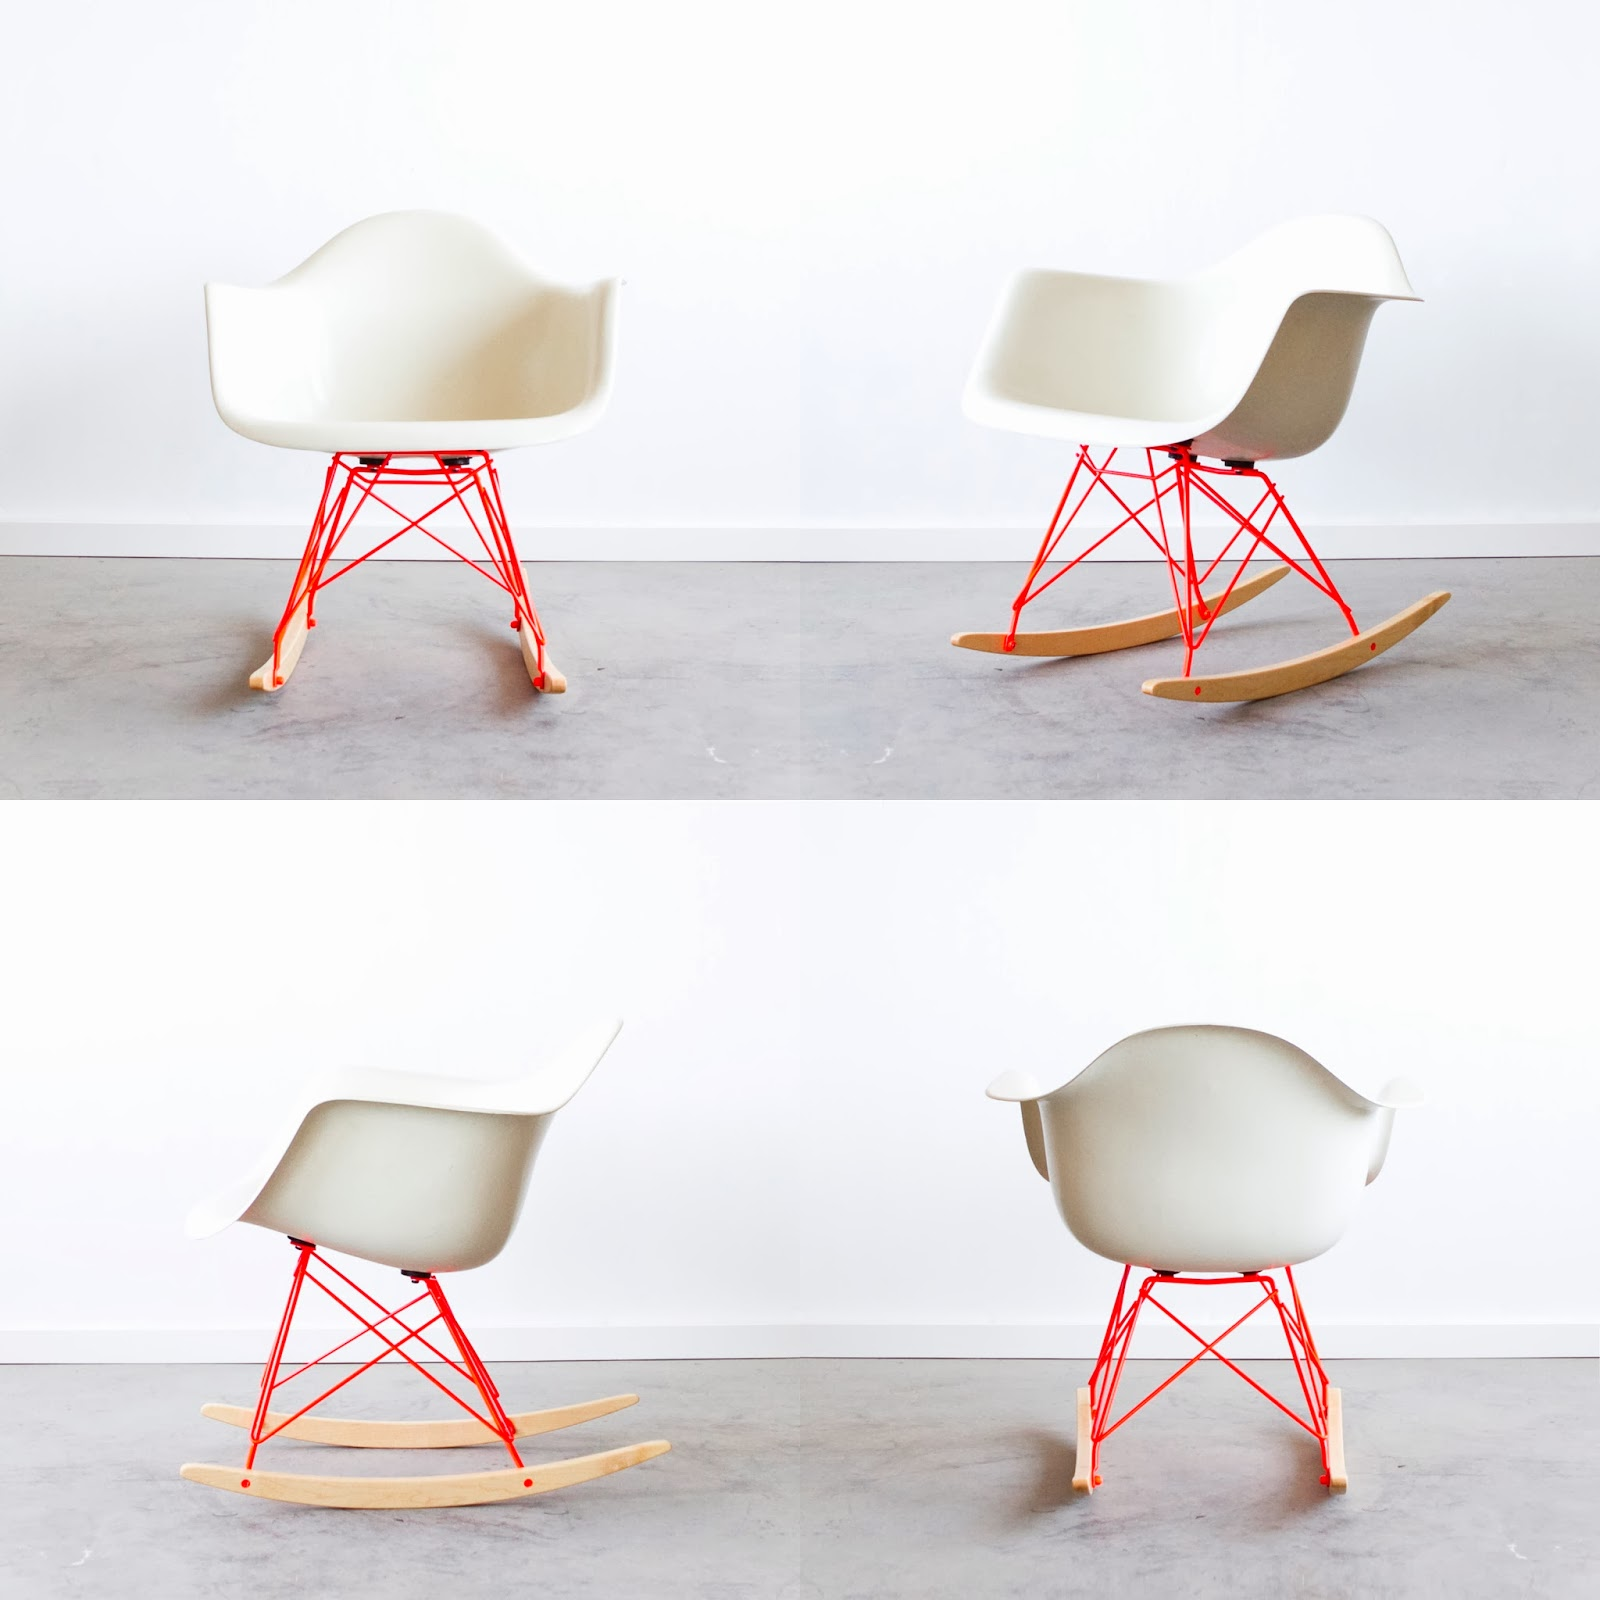 chaise eames customis e en rose fluo. Black Bedroom Furniture Sets. Home Design Ideas